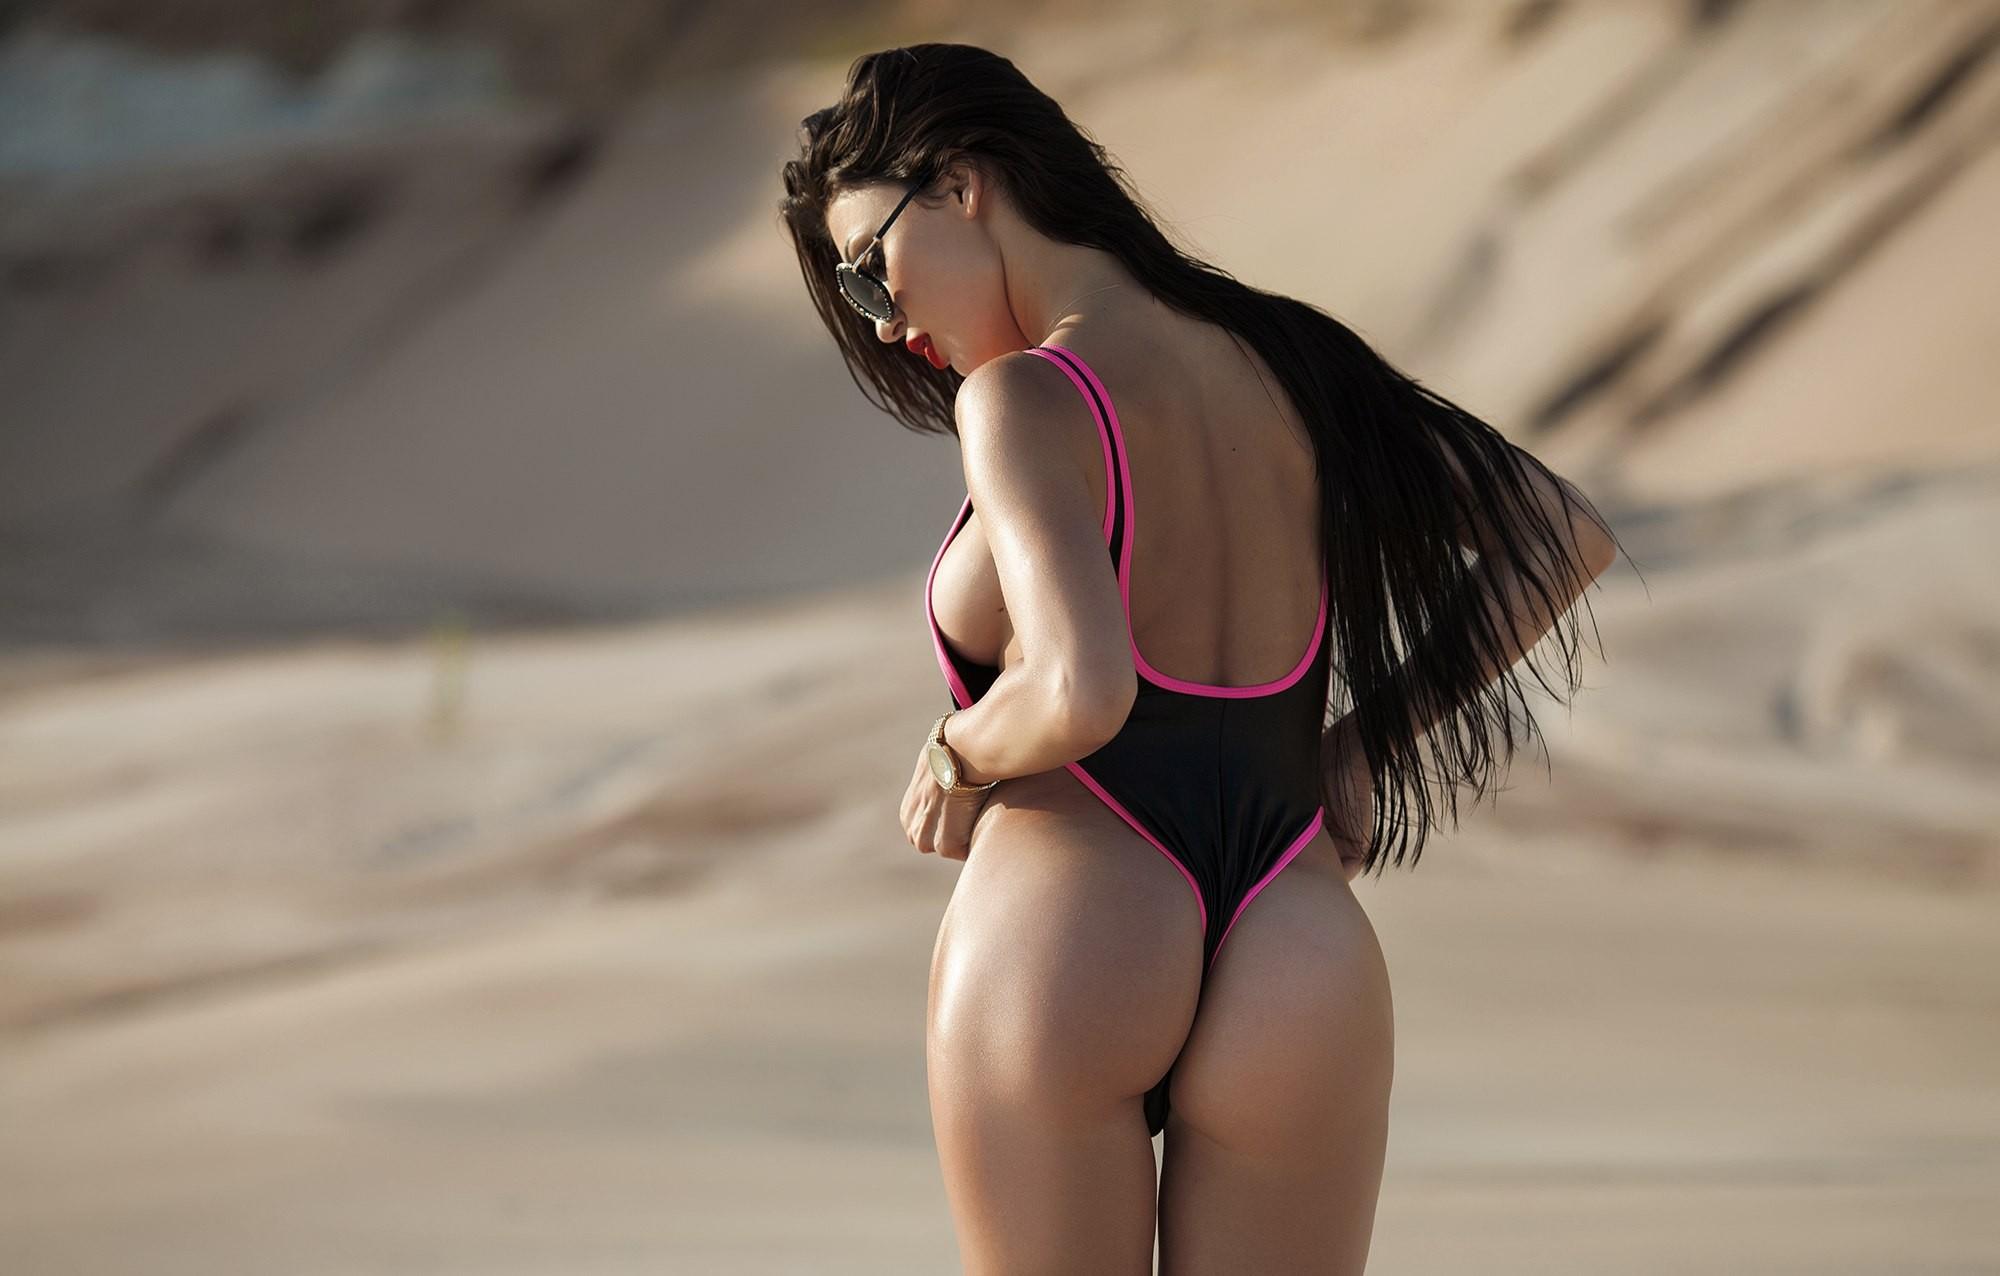 Busty leanne so hot in her tiny red bikini